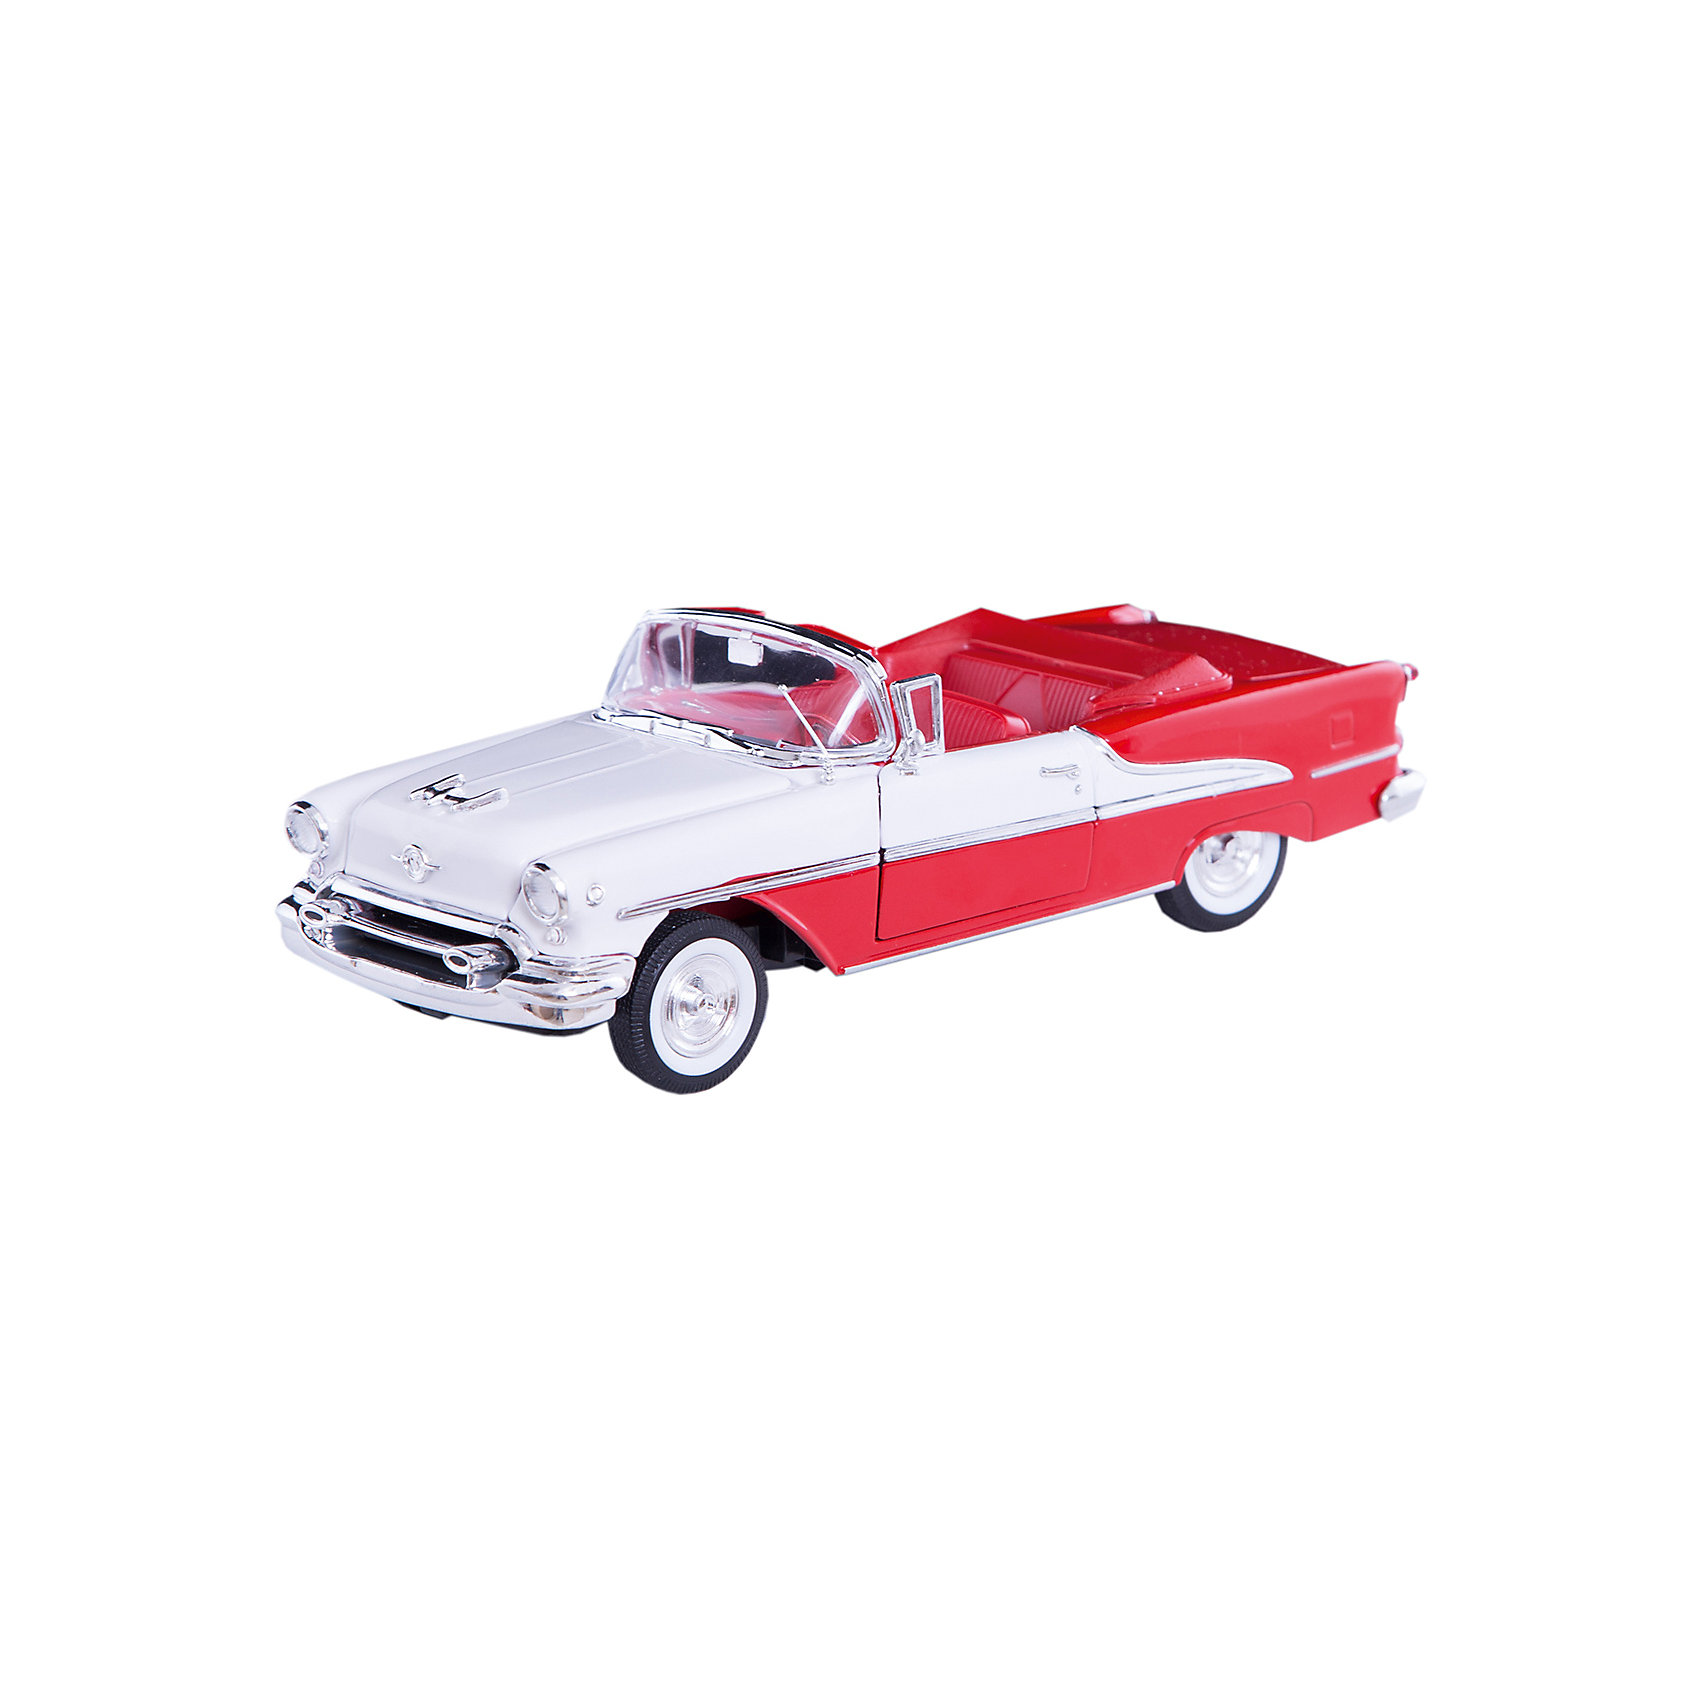 Welly Модель винтажной машины 1:24 Oldsmobile Super 1955, Welly welly модель машины 1 24 aston martin v12 vantage welly